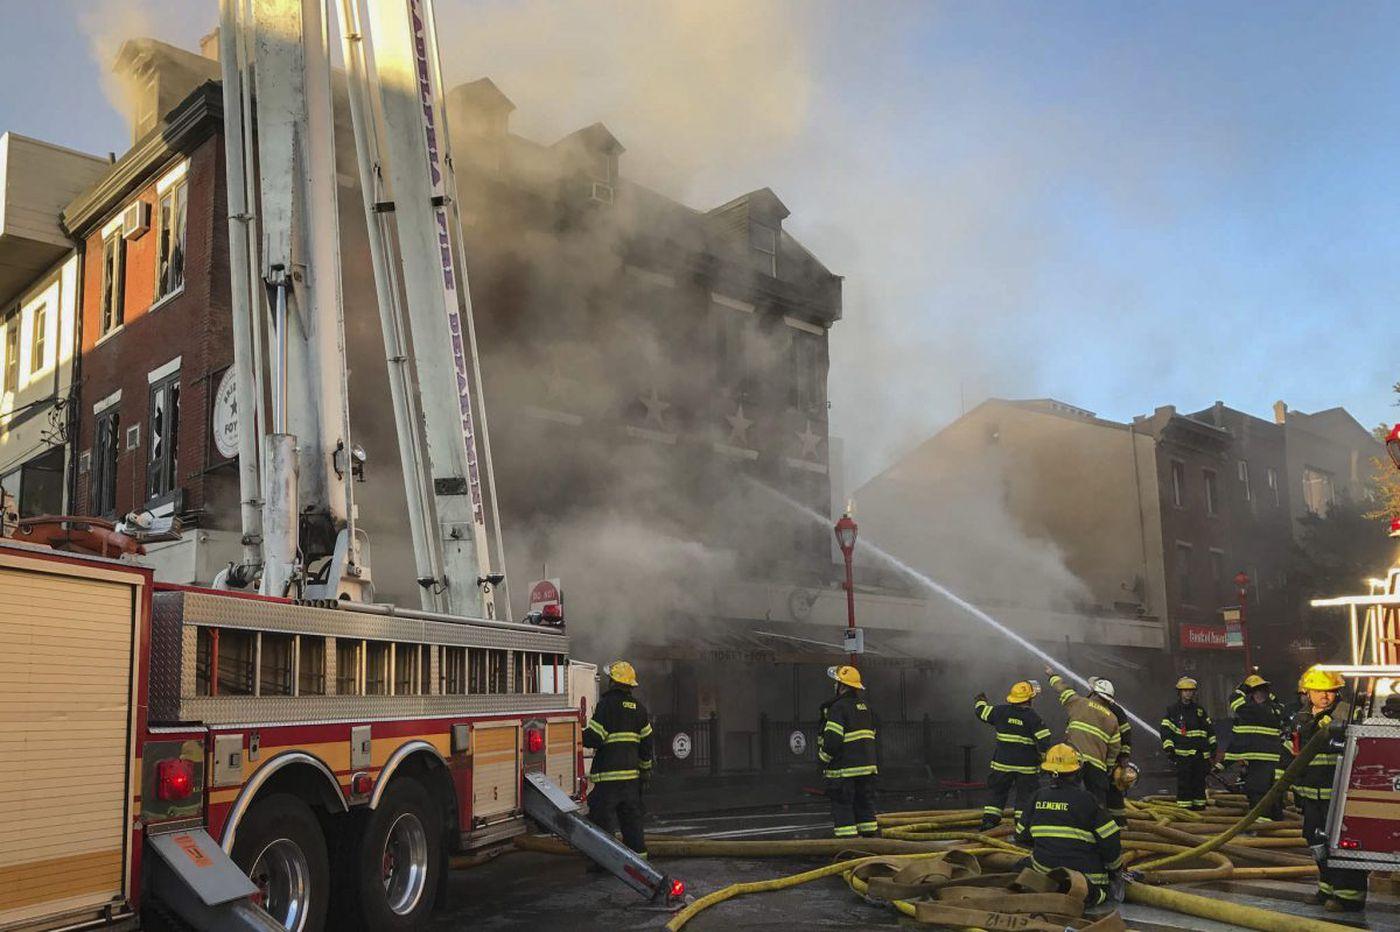 Fire rips through Bridget Foy's restaurant in Philly